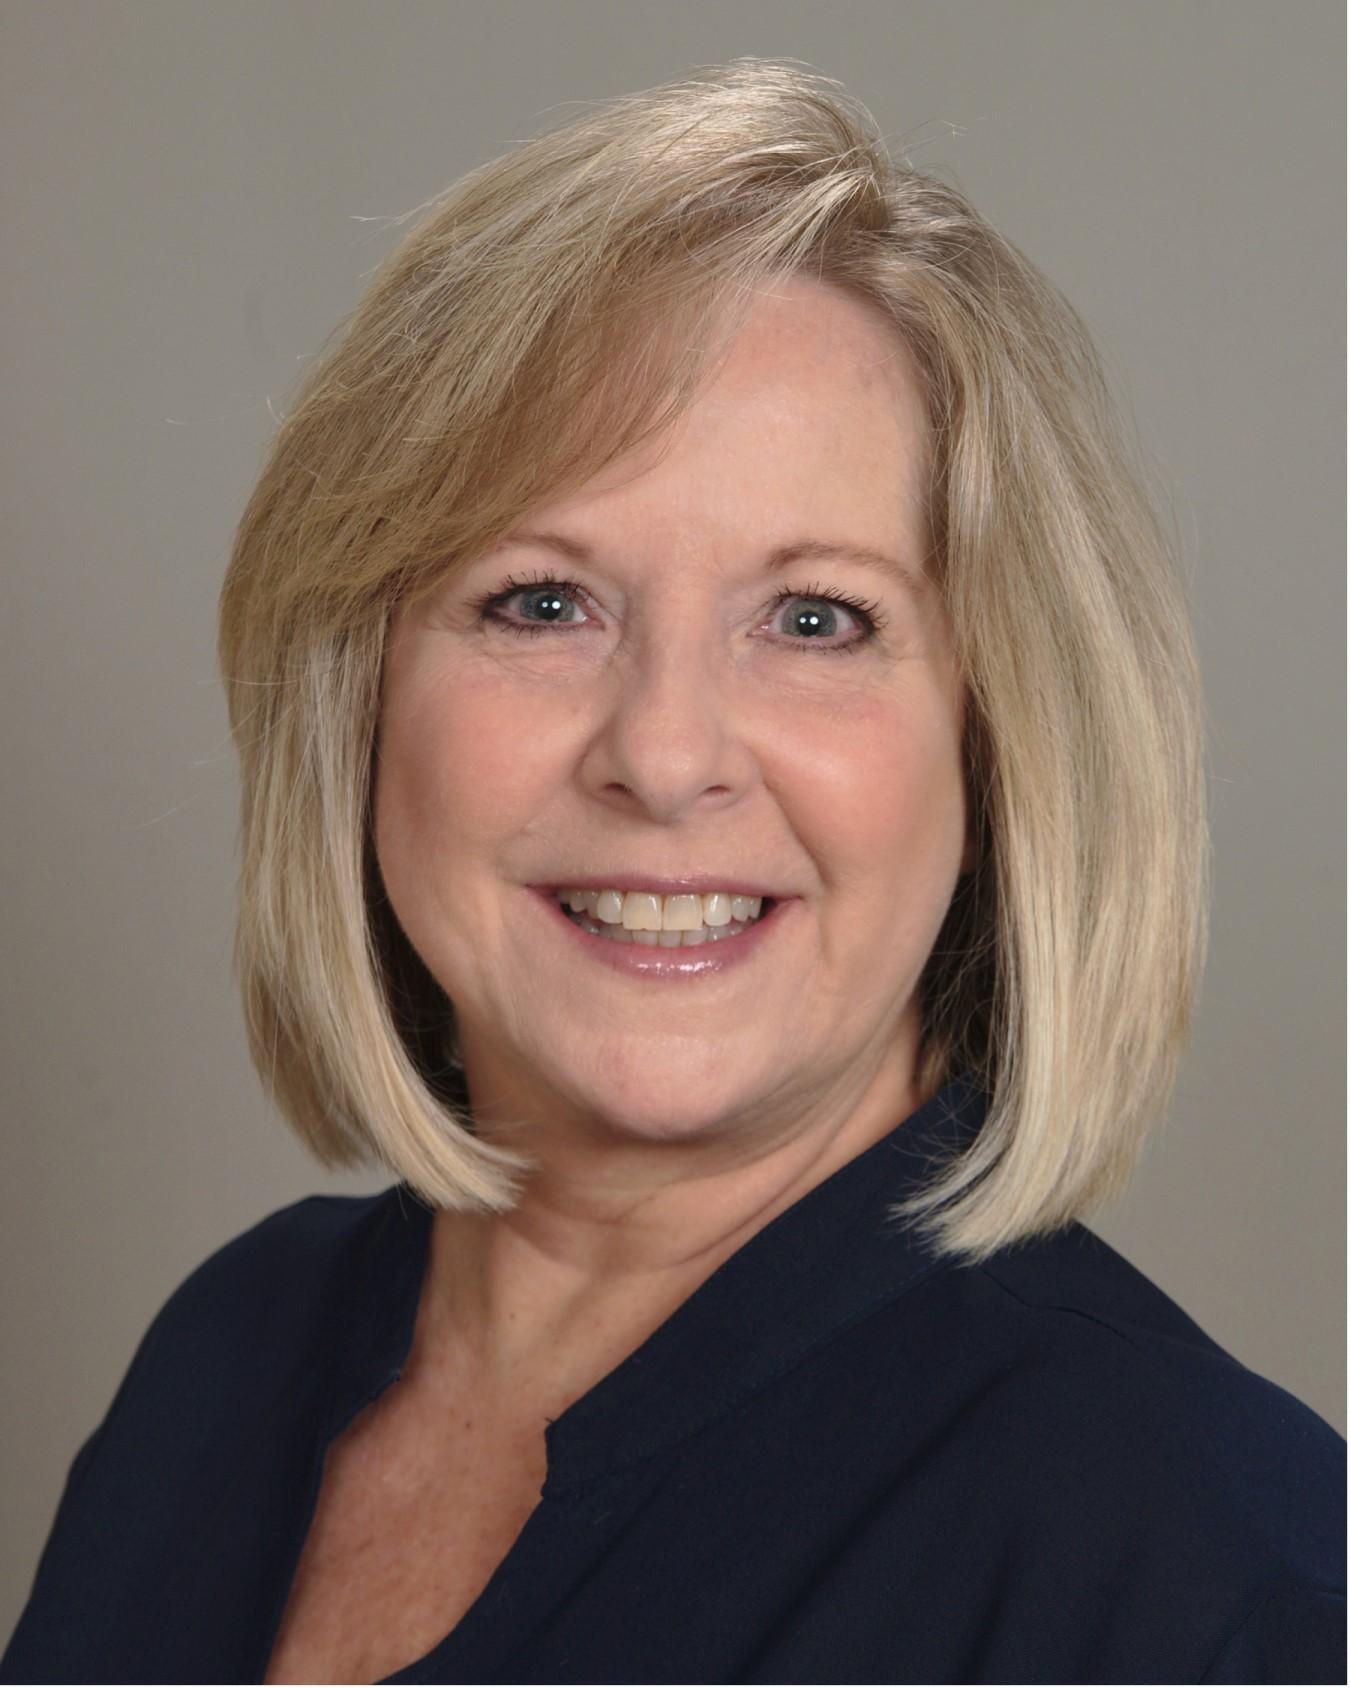 Sandra Allison